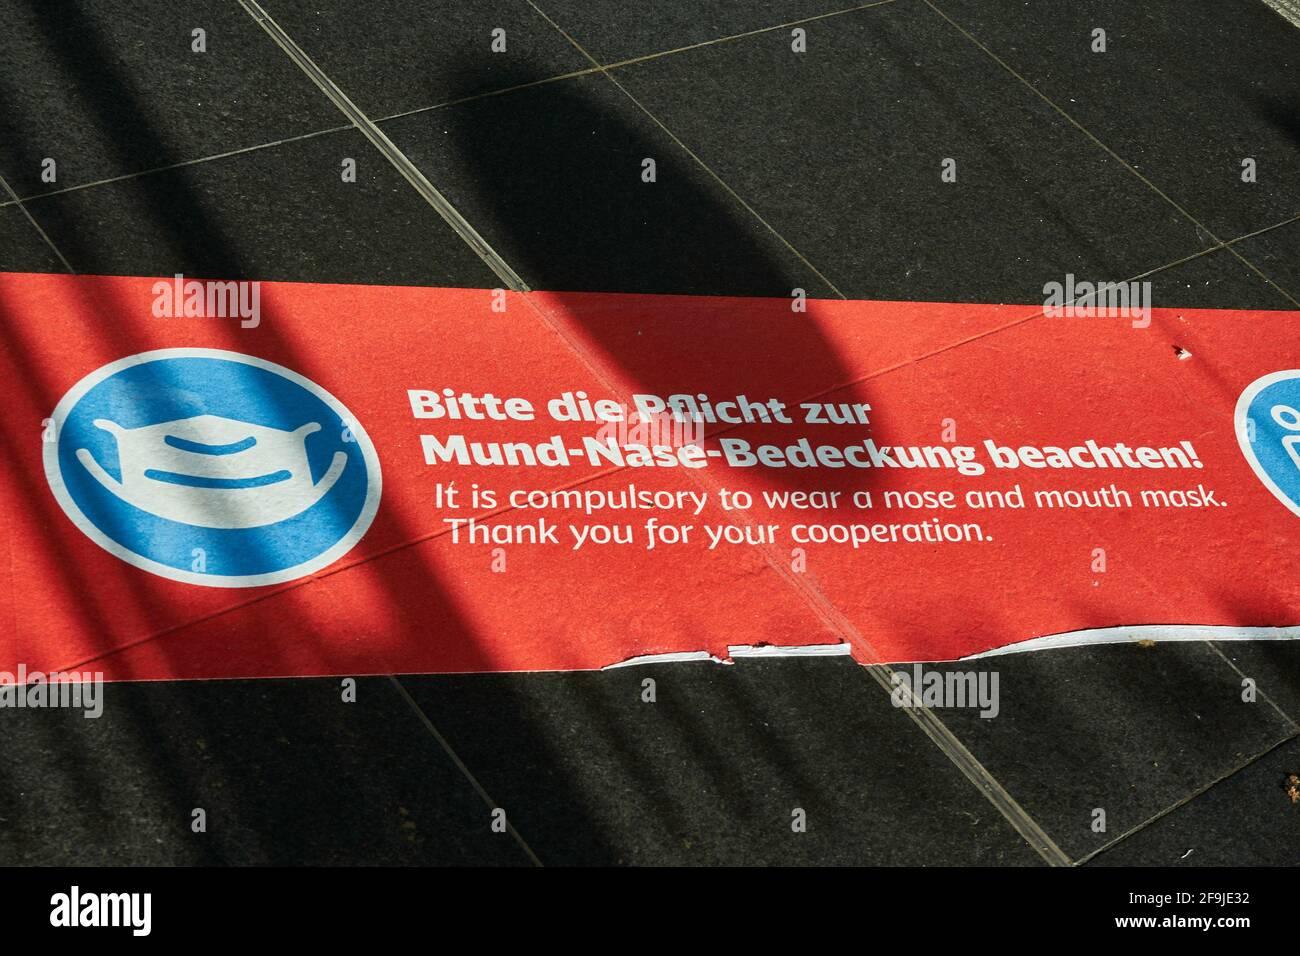 Corona Hinweis, AHA-Regeln, Bodenaufkleber, Abstand halten, Infektionsschutz gegen Covid 19, Hauptbahnhof Berlin, Deutschland Stock Photo